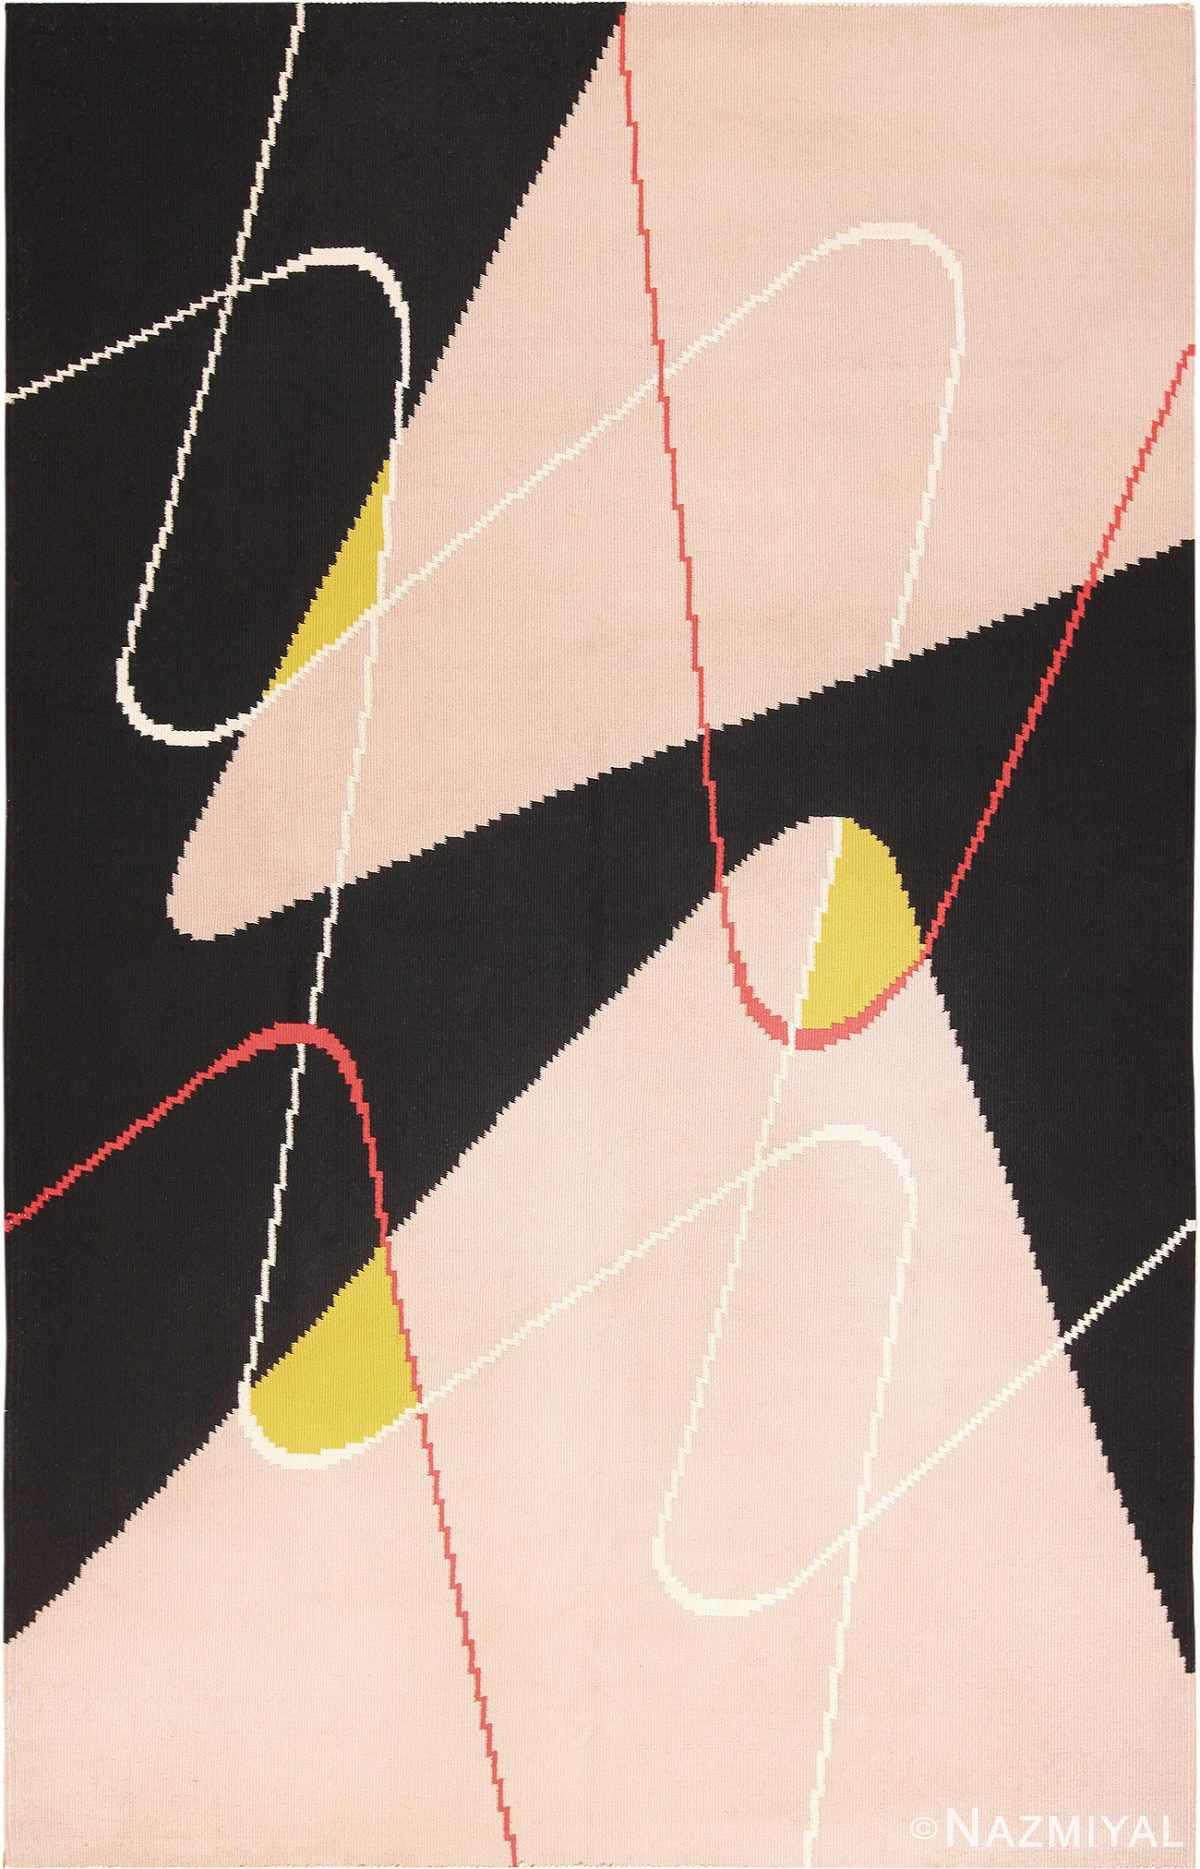 Black Cream Flat Woven Vintage French Art Deco Rug #49929 - Nazmiyal